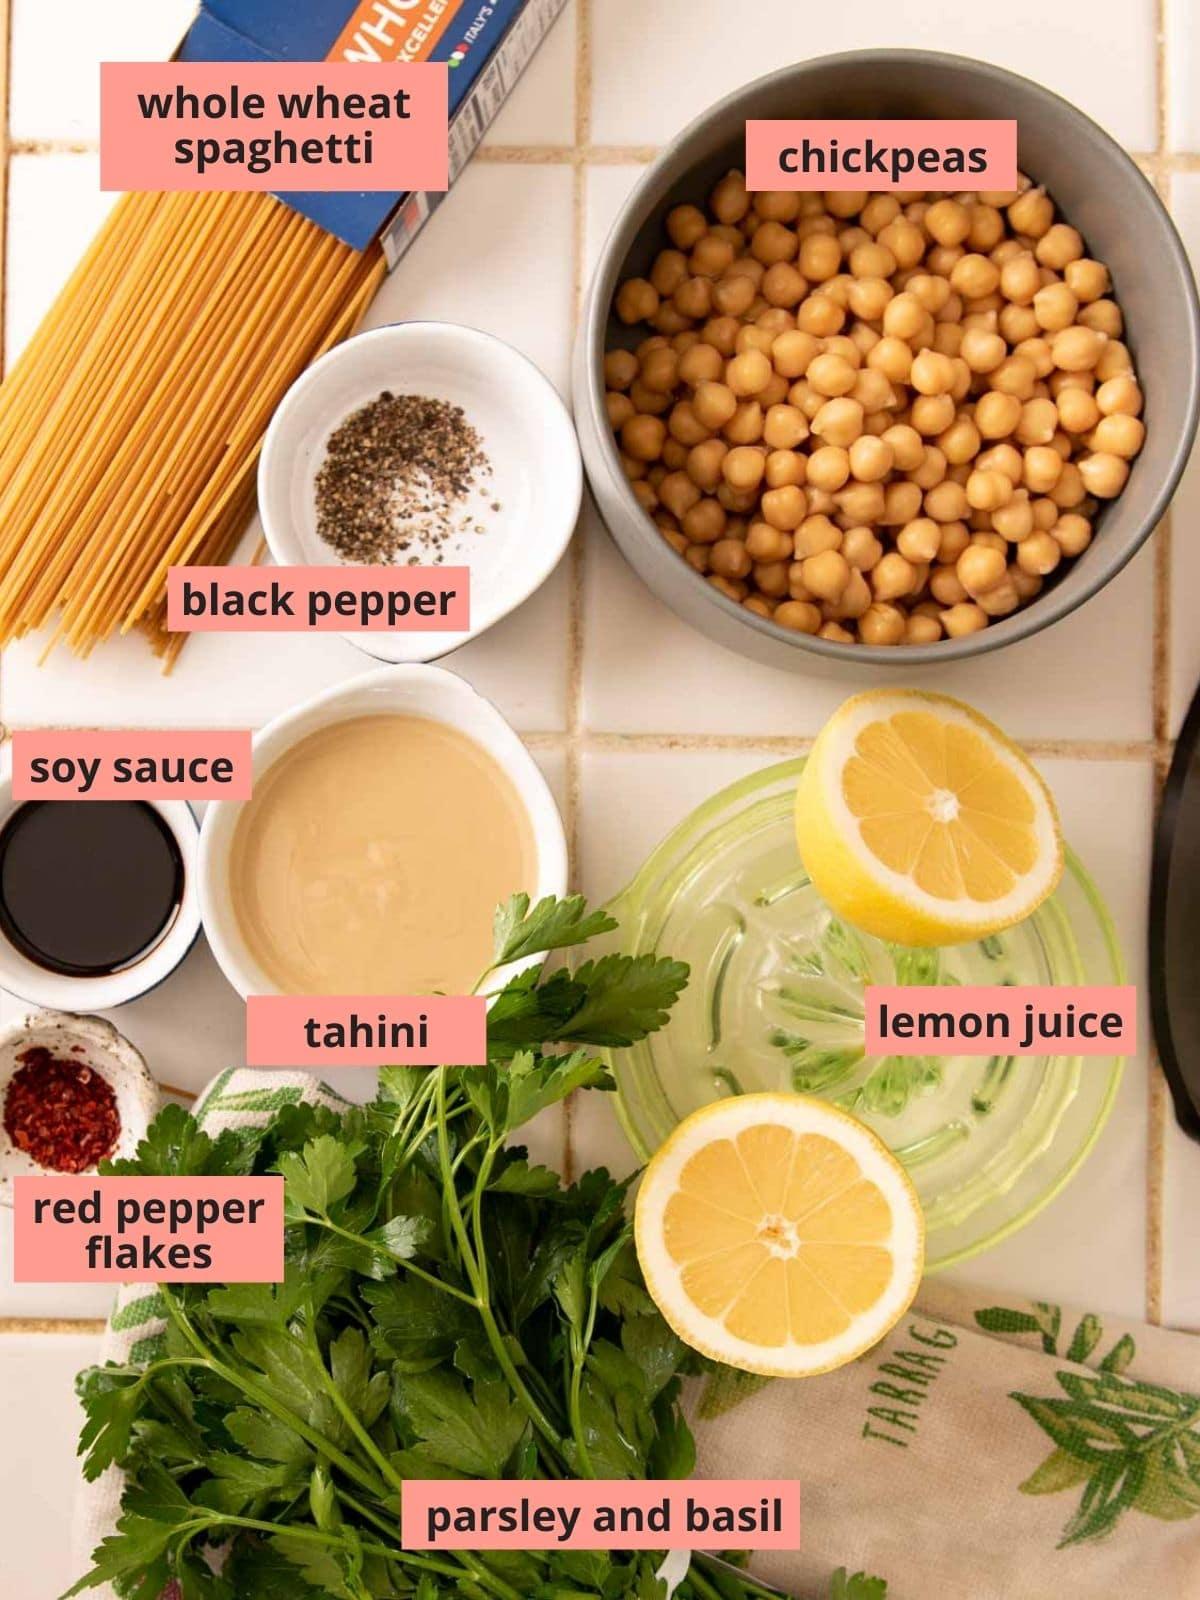 Labeled ingredients used to make tahini pasta